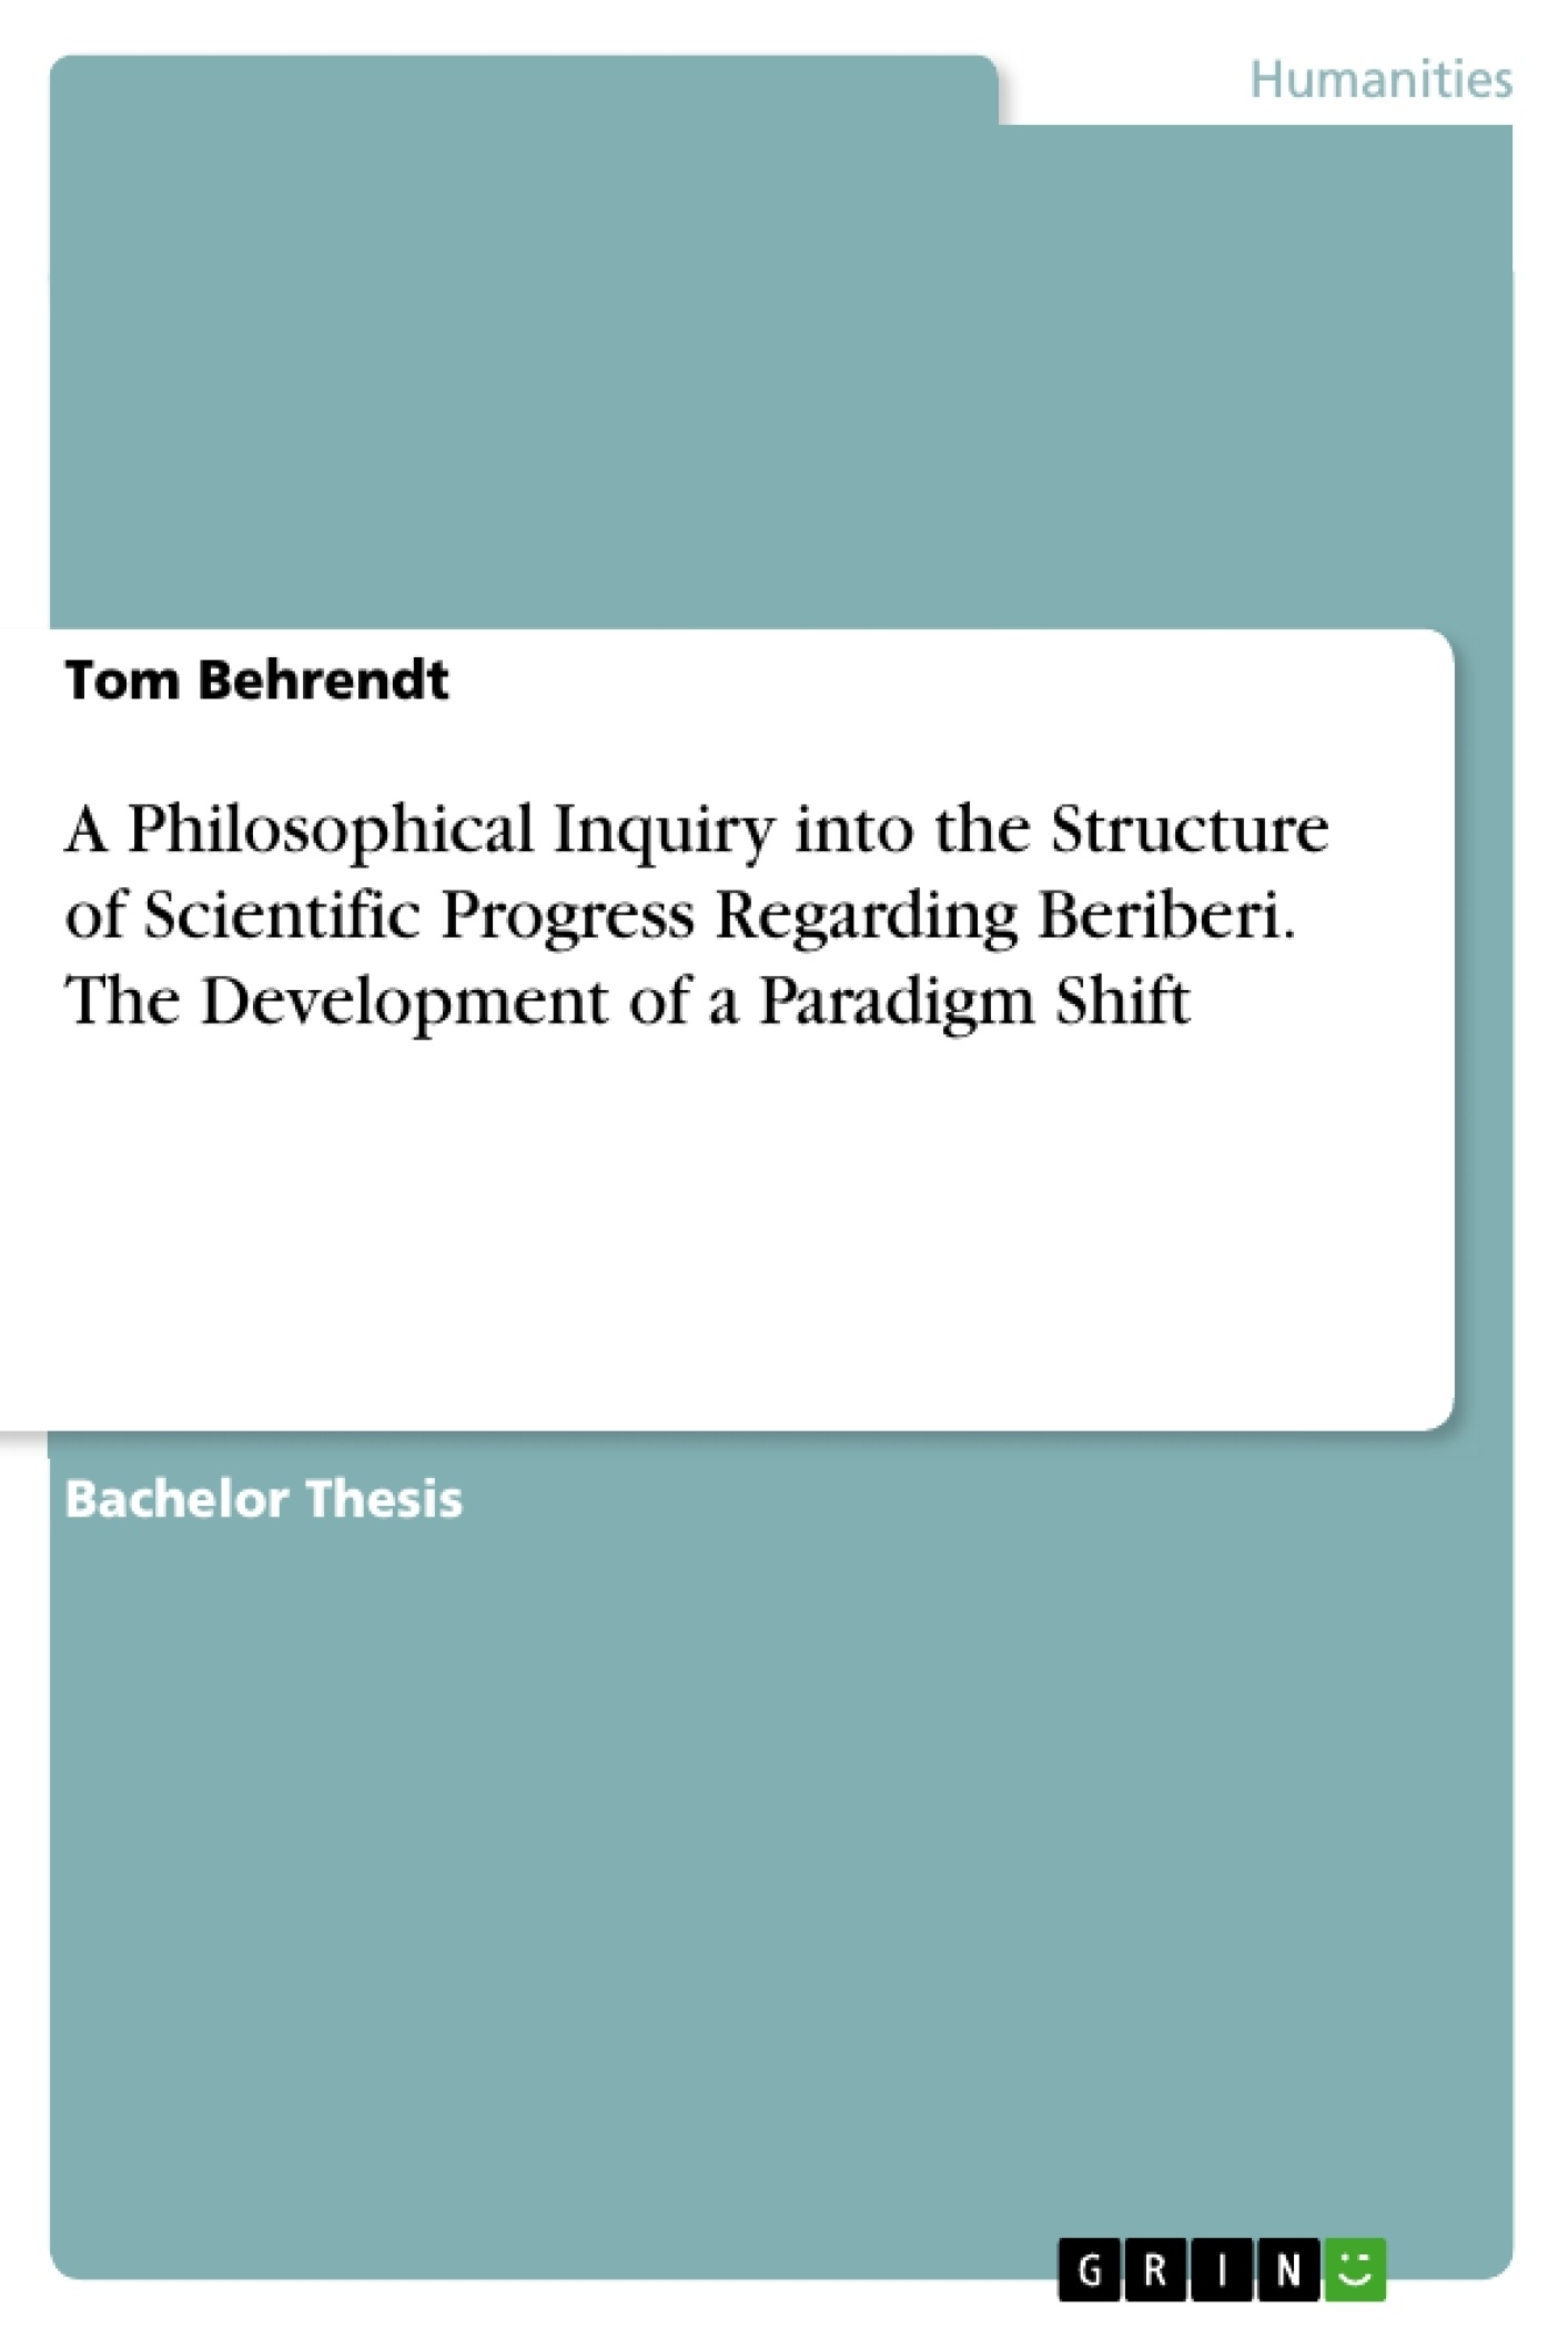 Title: A Philosophical Inquiry into the Structure of Scientific Progress Regarding Beriberi. The Development of a Paradigm Shift